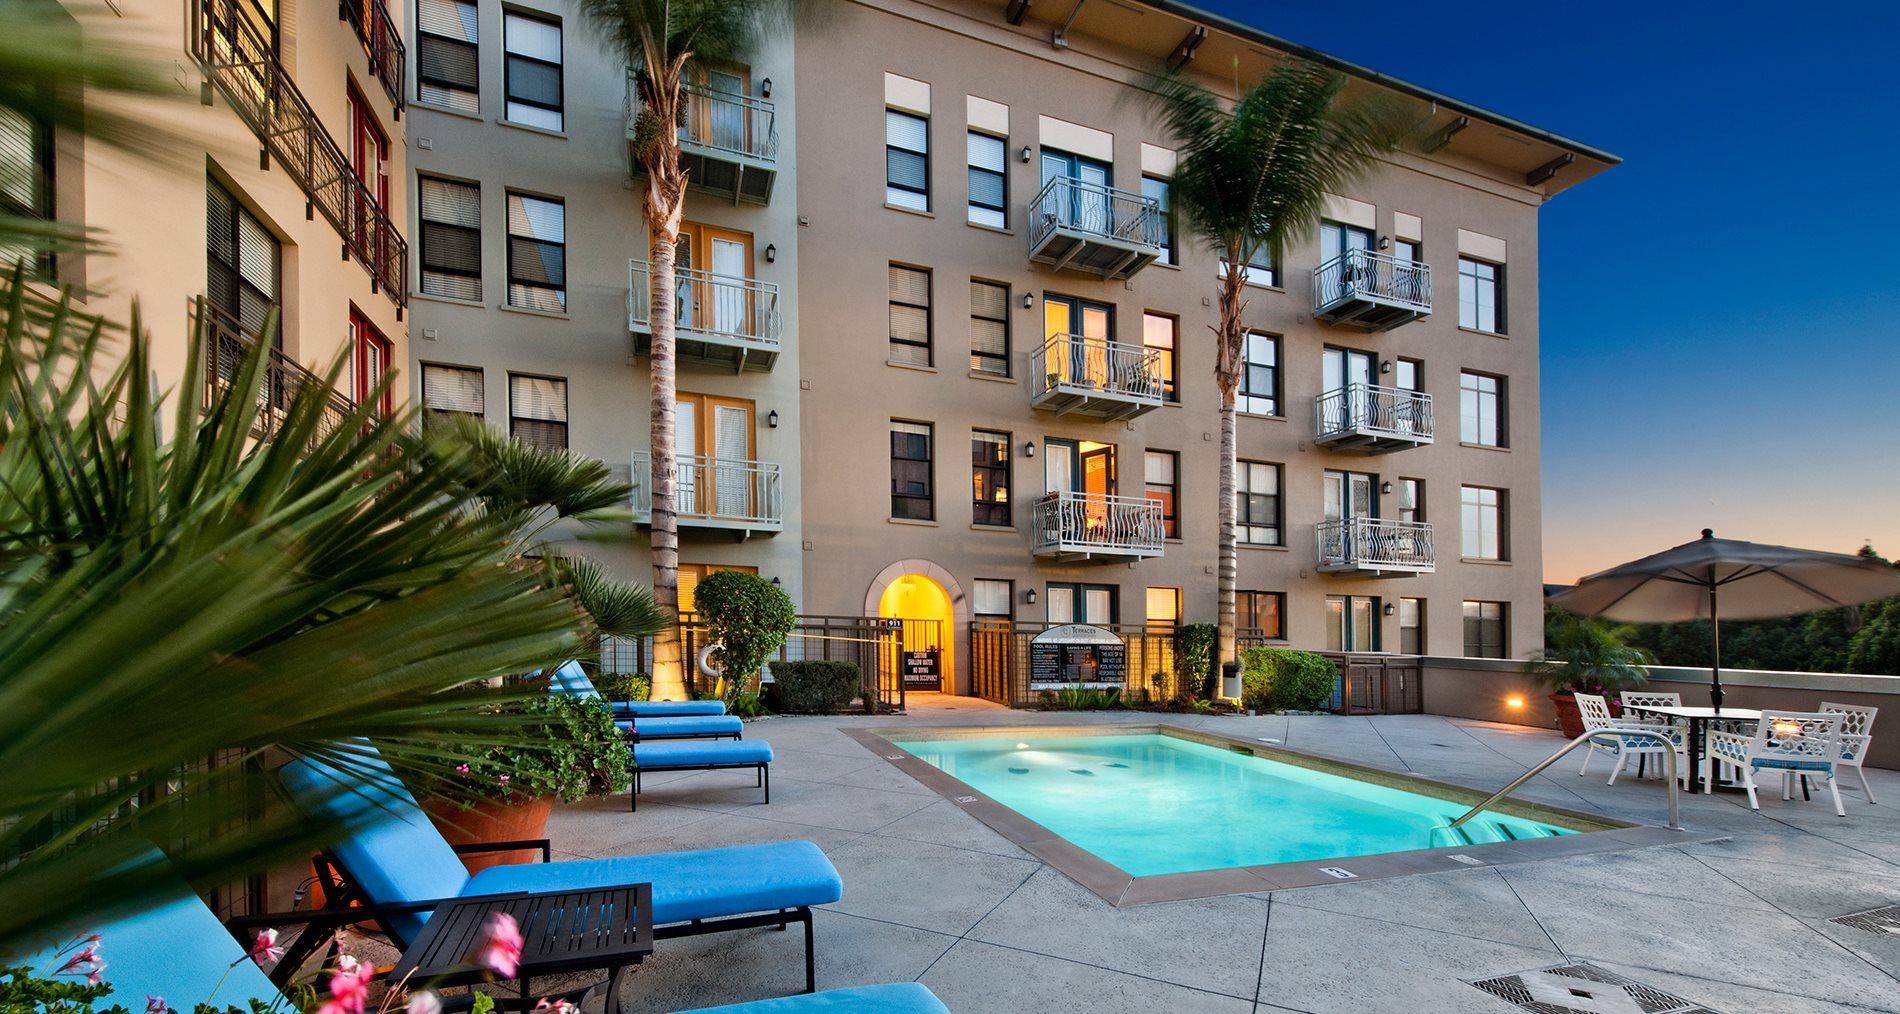 Terraces At Paseo Colorado Pasadena Luxury Apartments Home